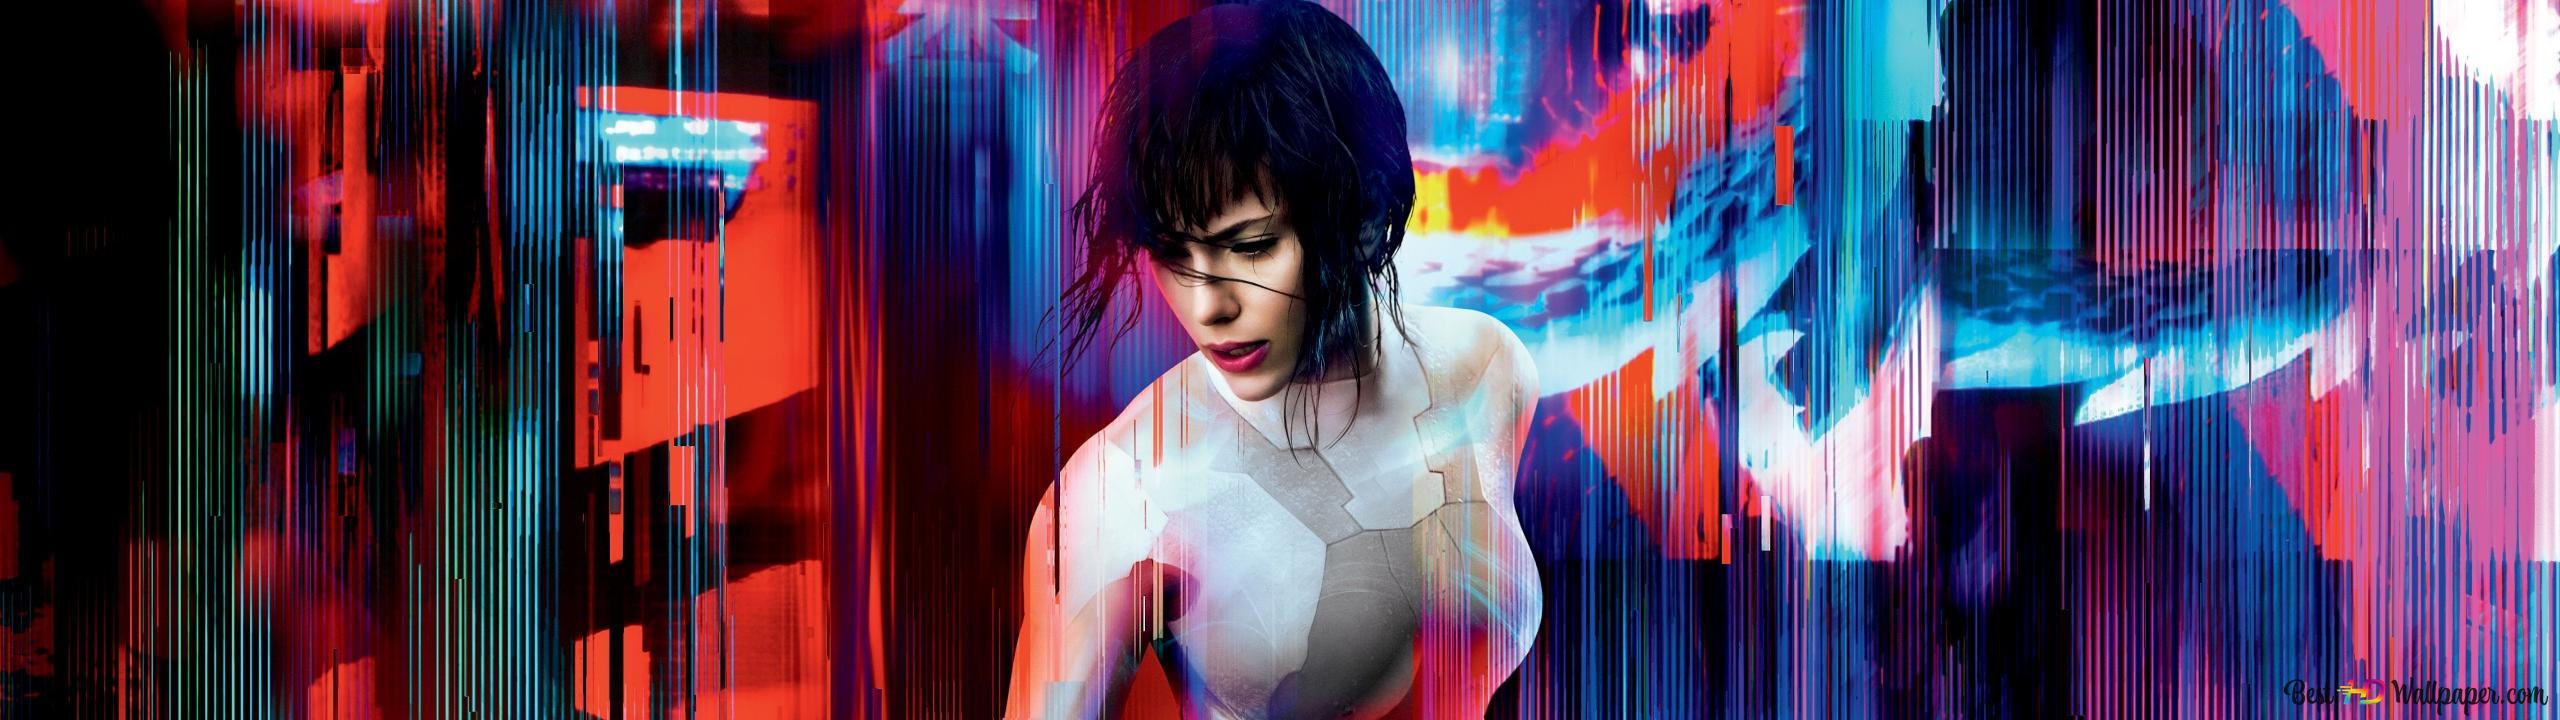 Ghost In The Shell Movie Scarlett Johansson Hd Wallpaper Download